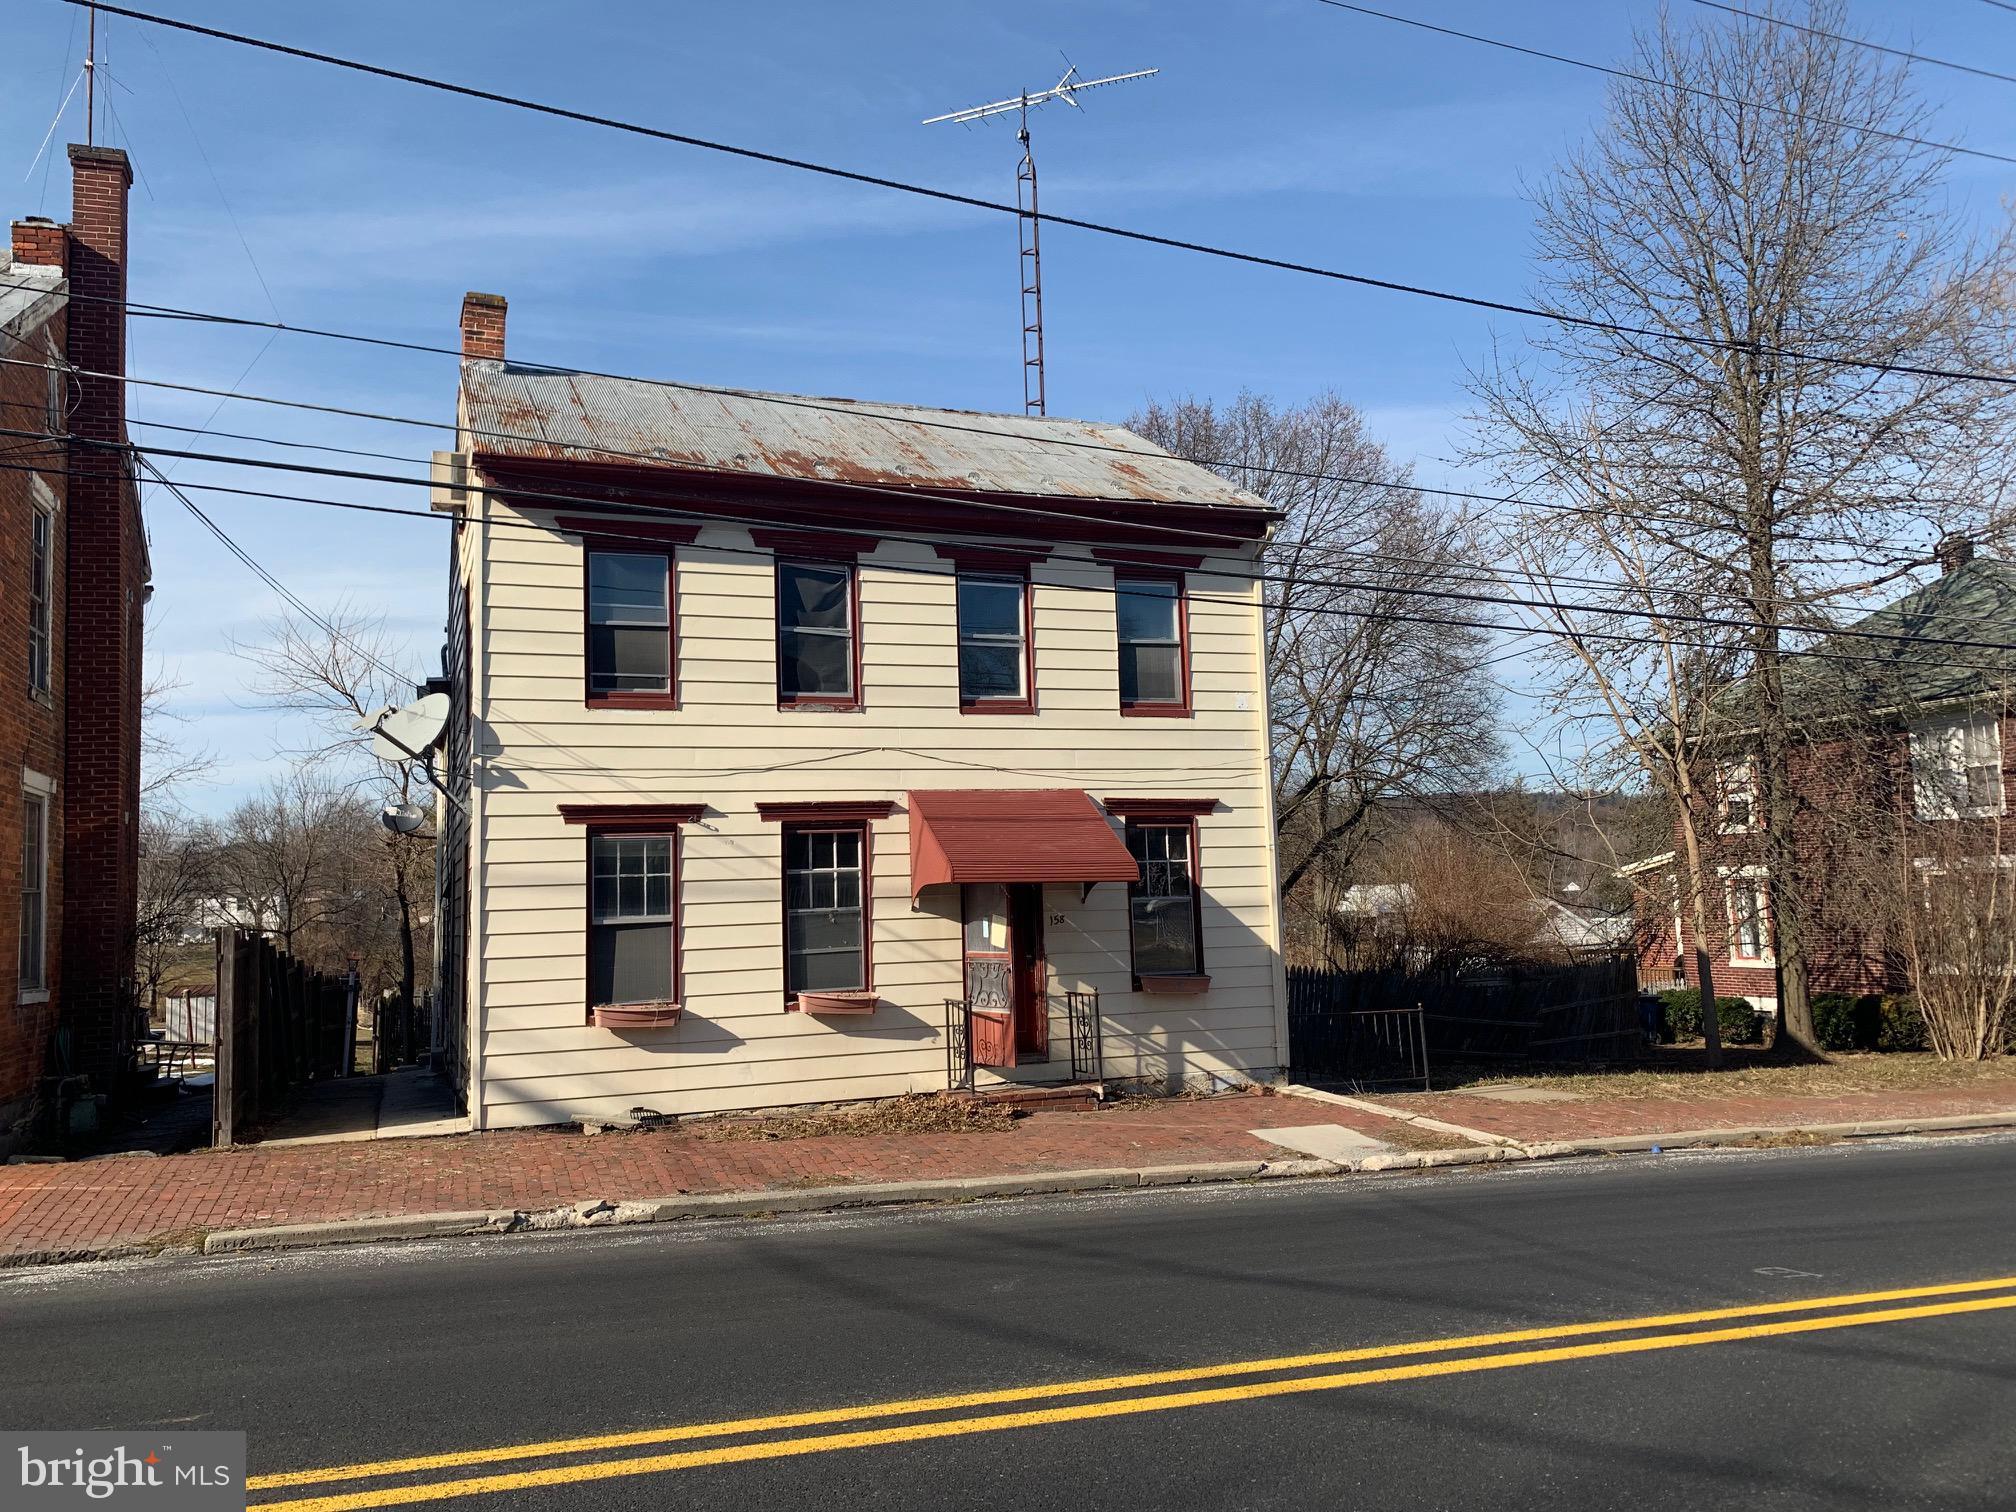 158 MAIN STREET, ARENDTSVILLE, PA 17303